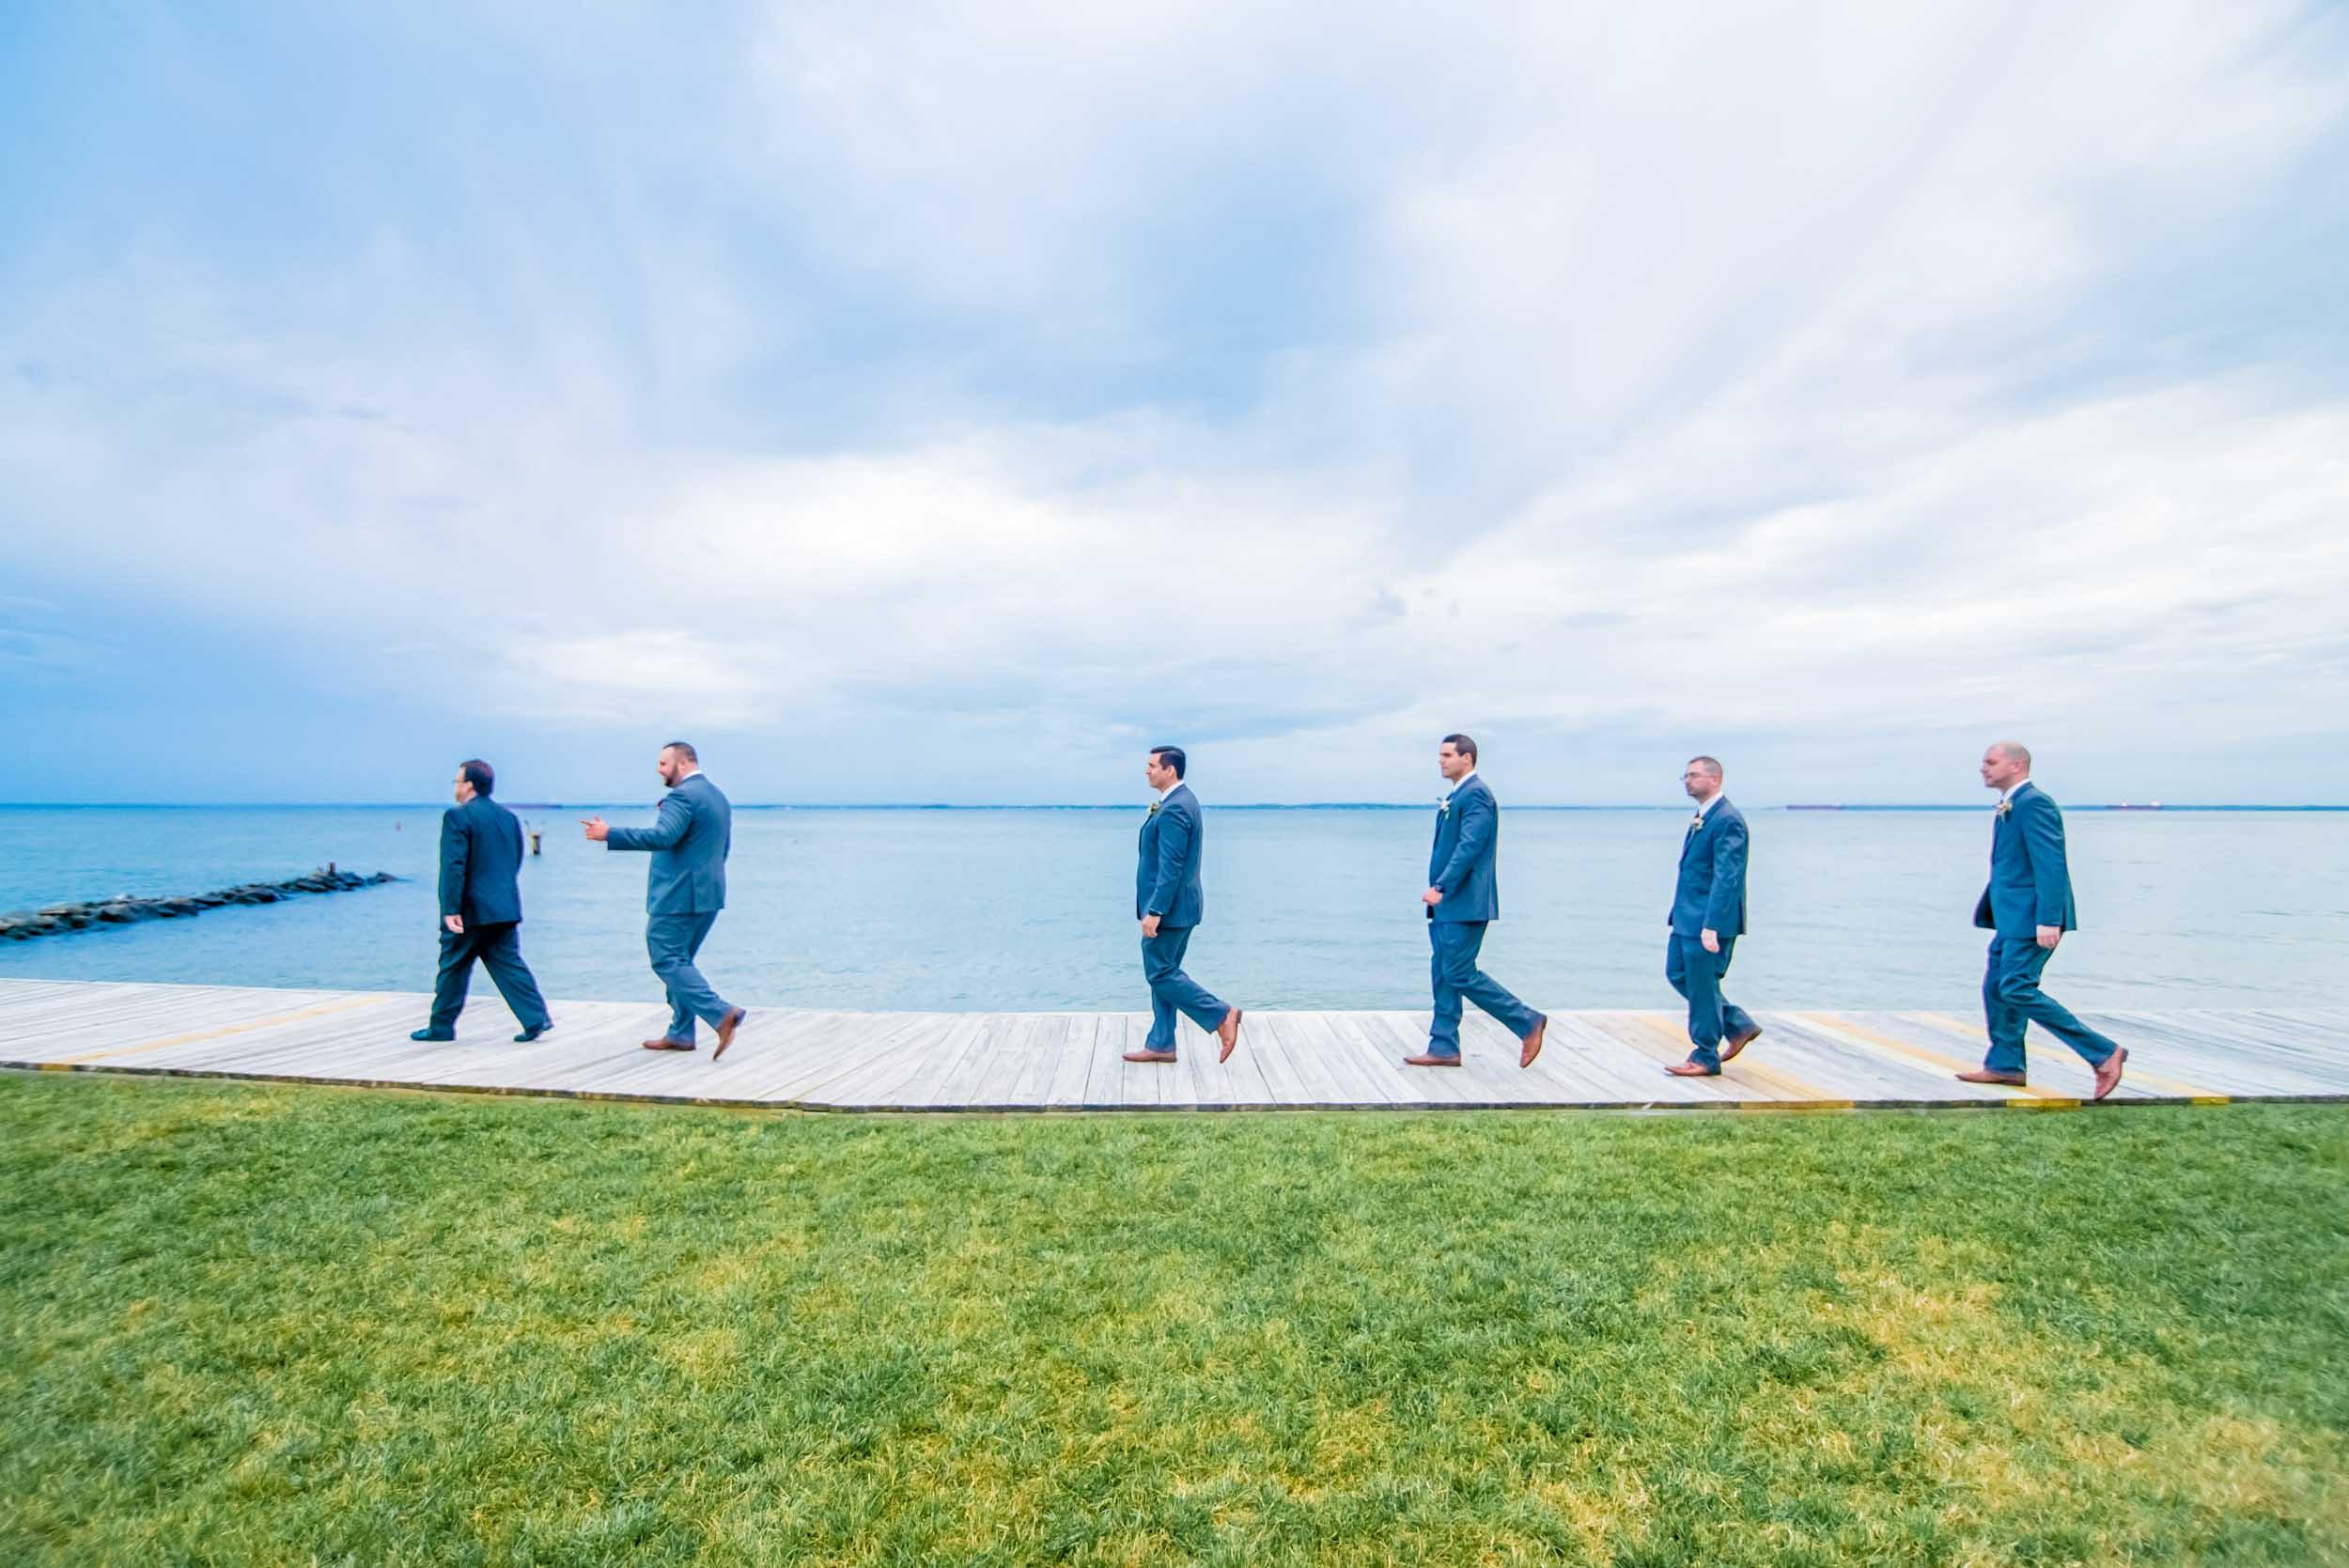 dc+metro+wedding+photographer+vadym+guliuk+photography+wedding+ceremony-2041.jpg